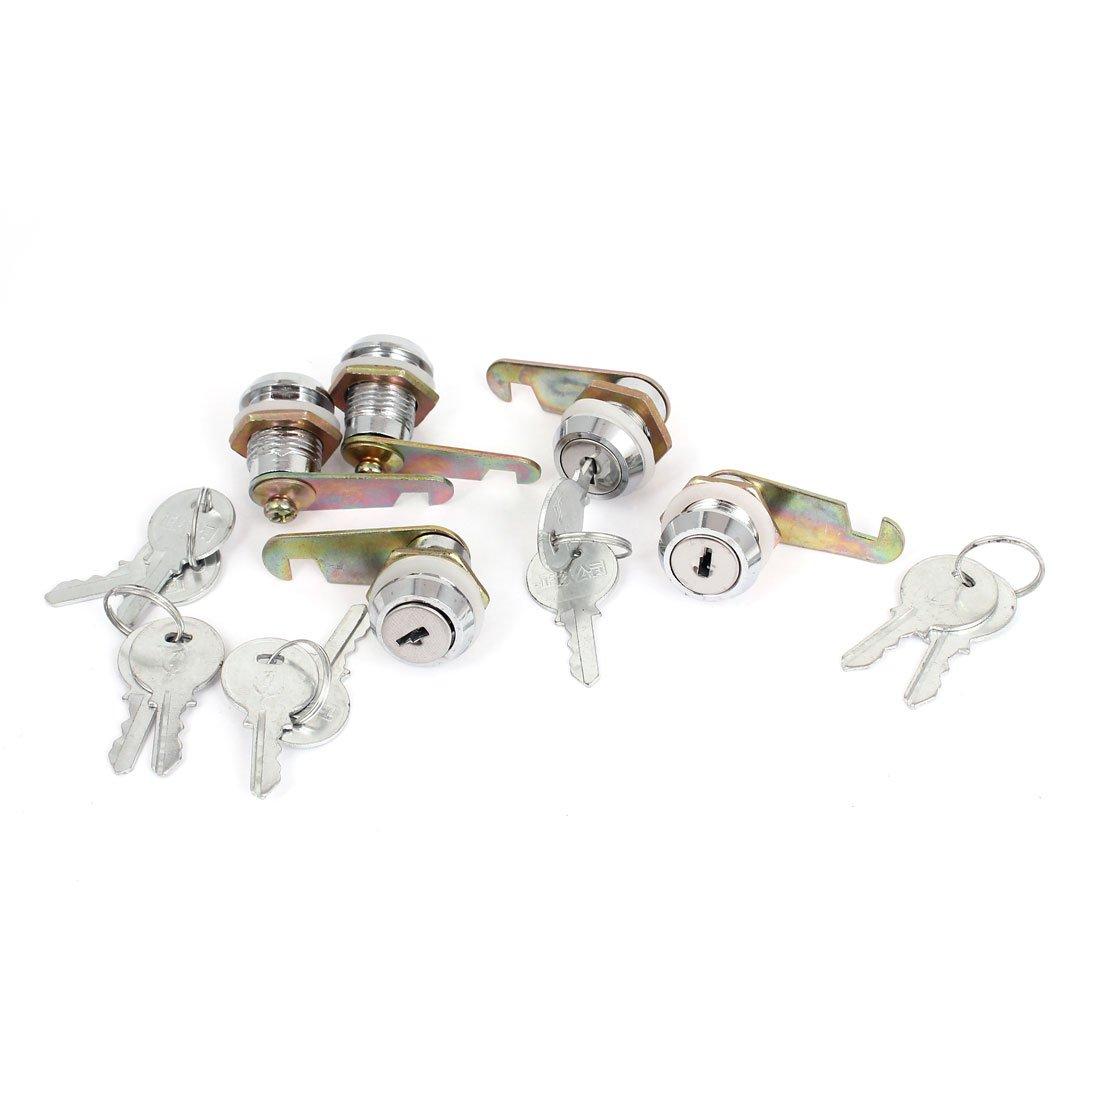 Cabinet Toolbox Drawer 17.5mm Dia Thread Shaft Tubular Cam Lock 5pcs